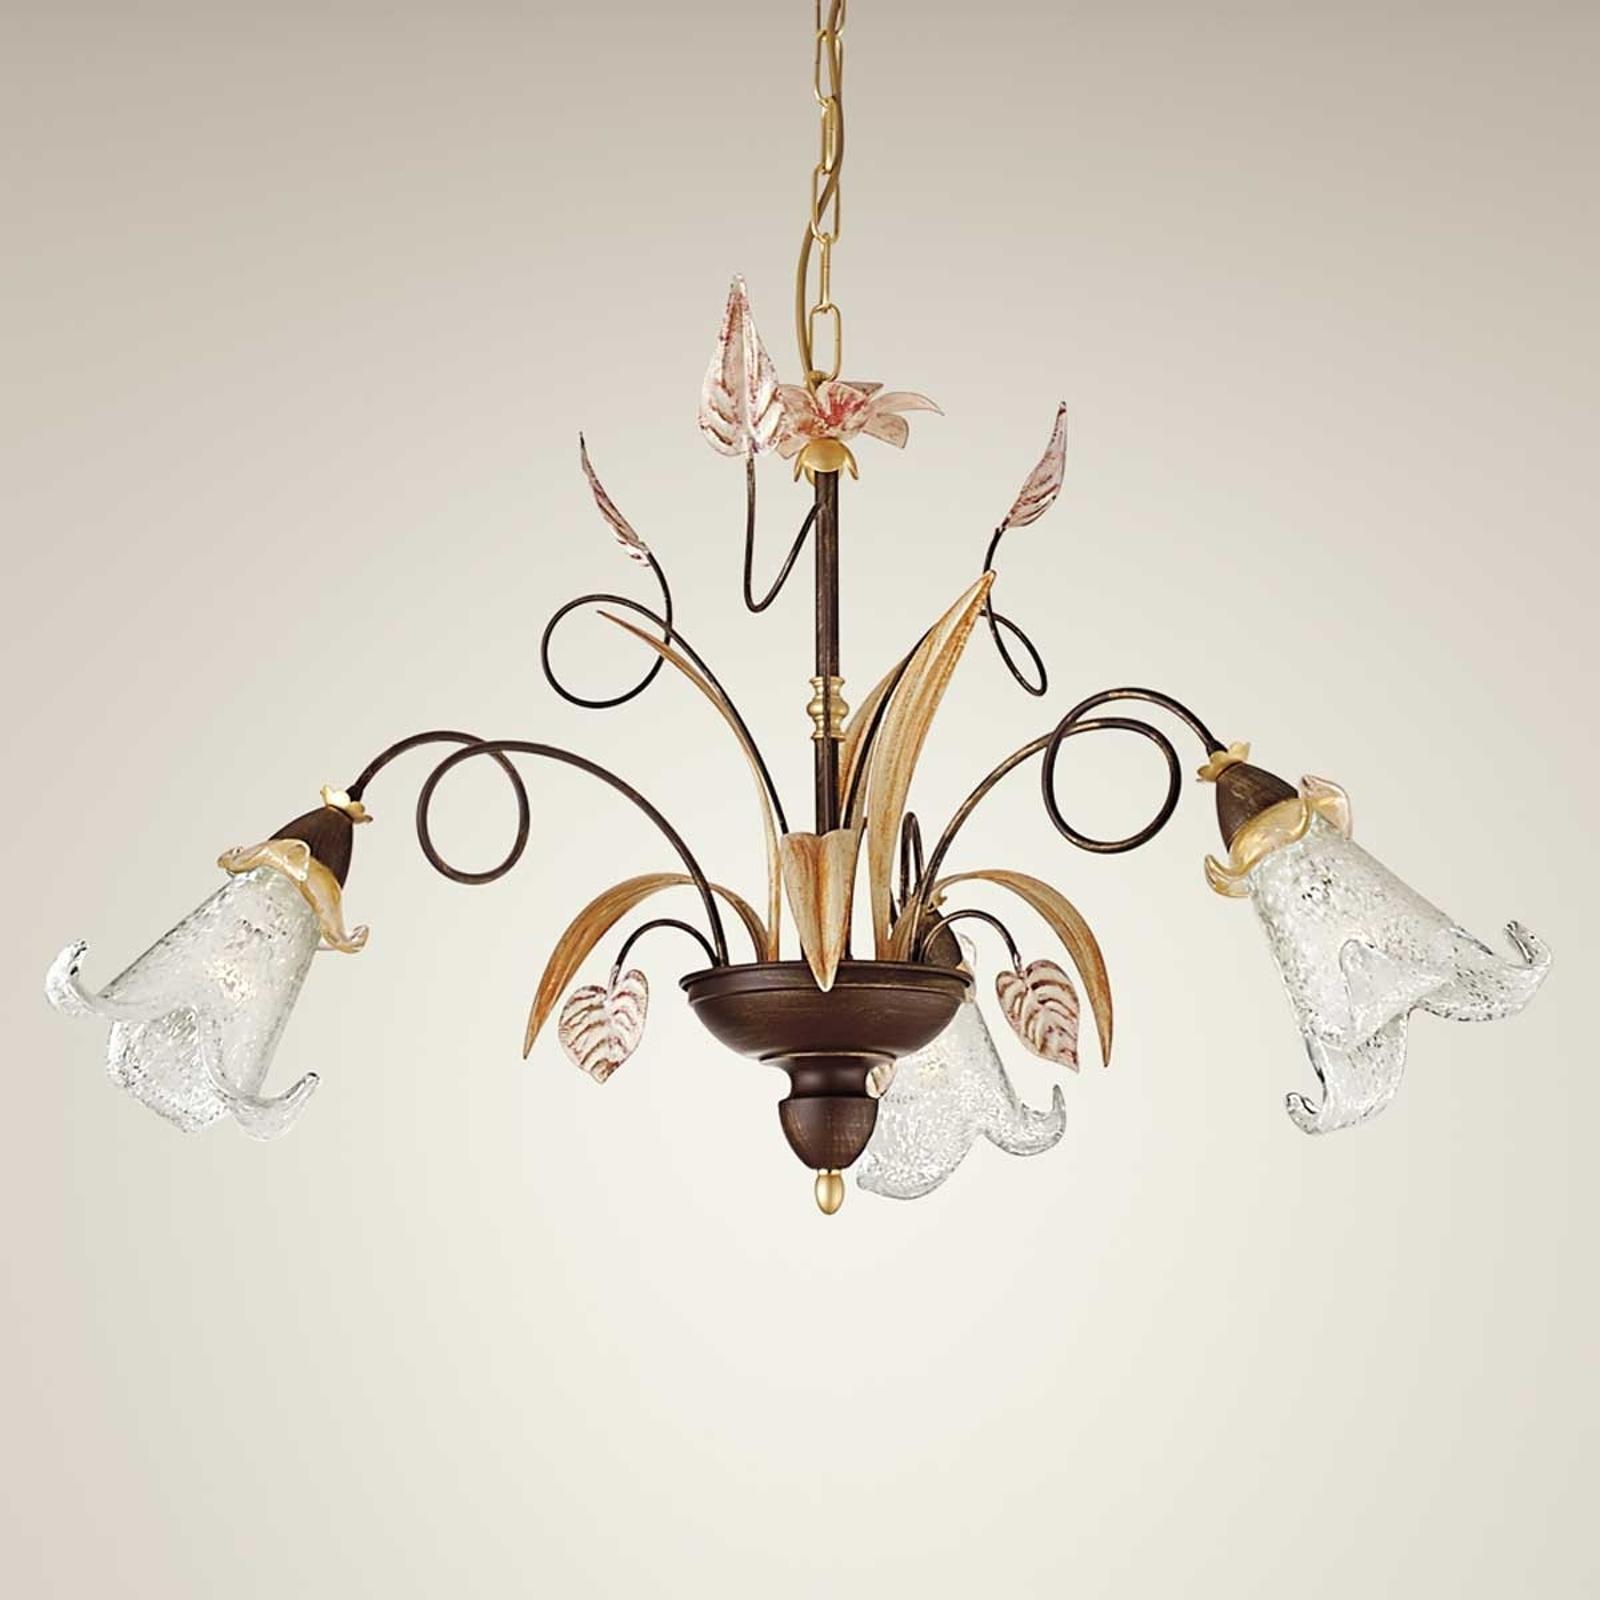 Florale hanglamp Giuseppe, 3-lichts